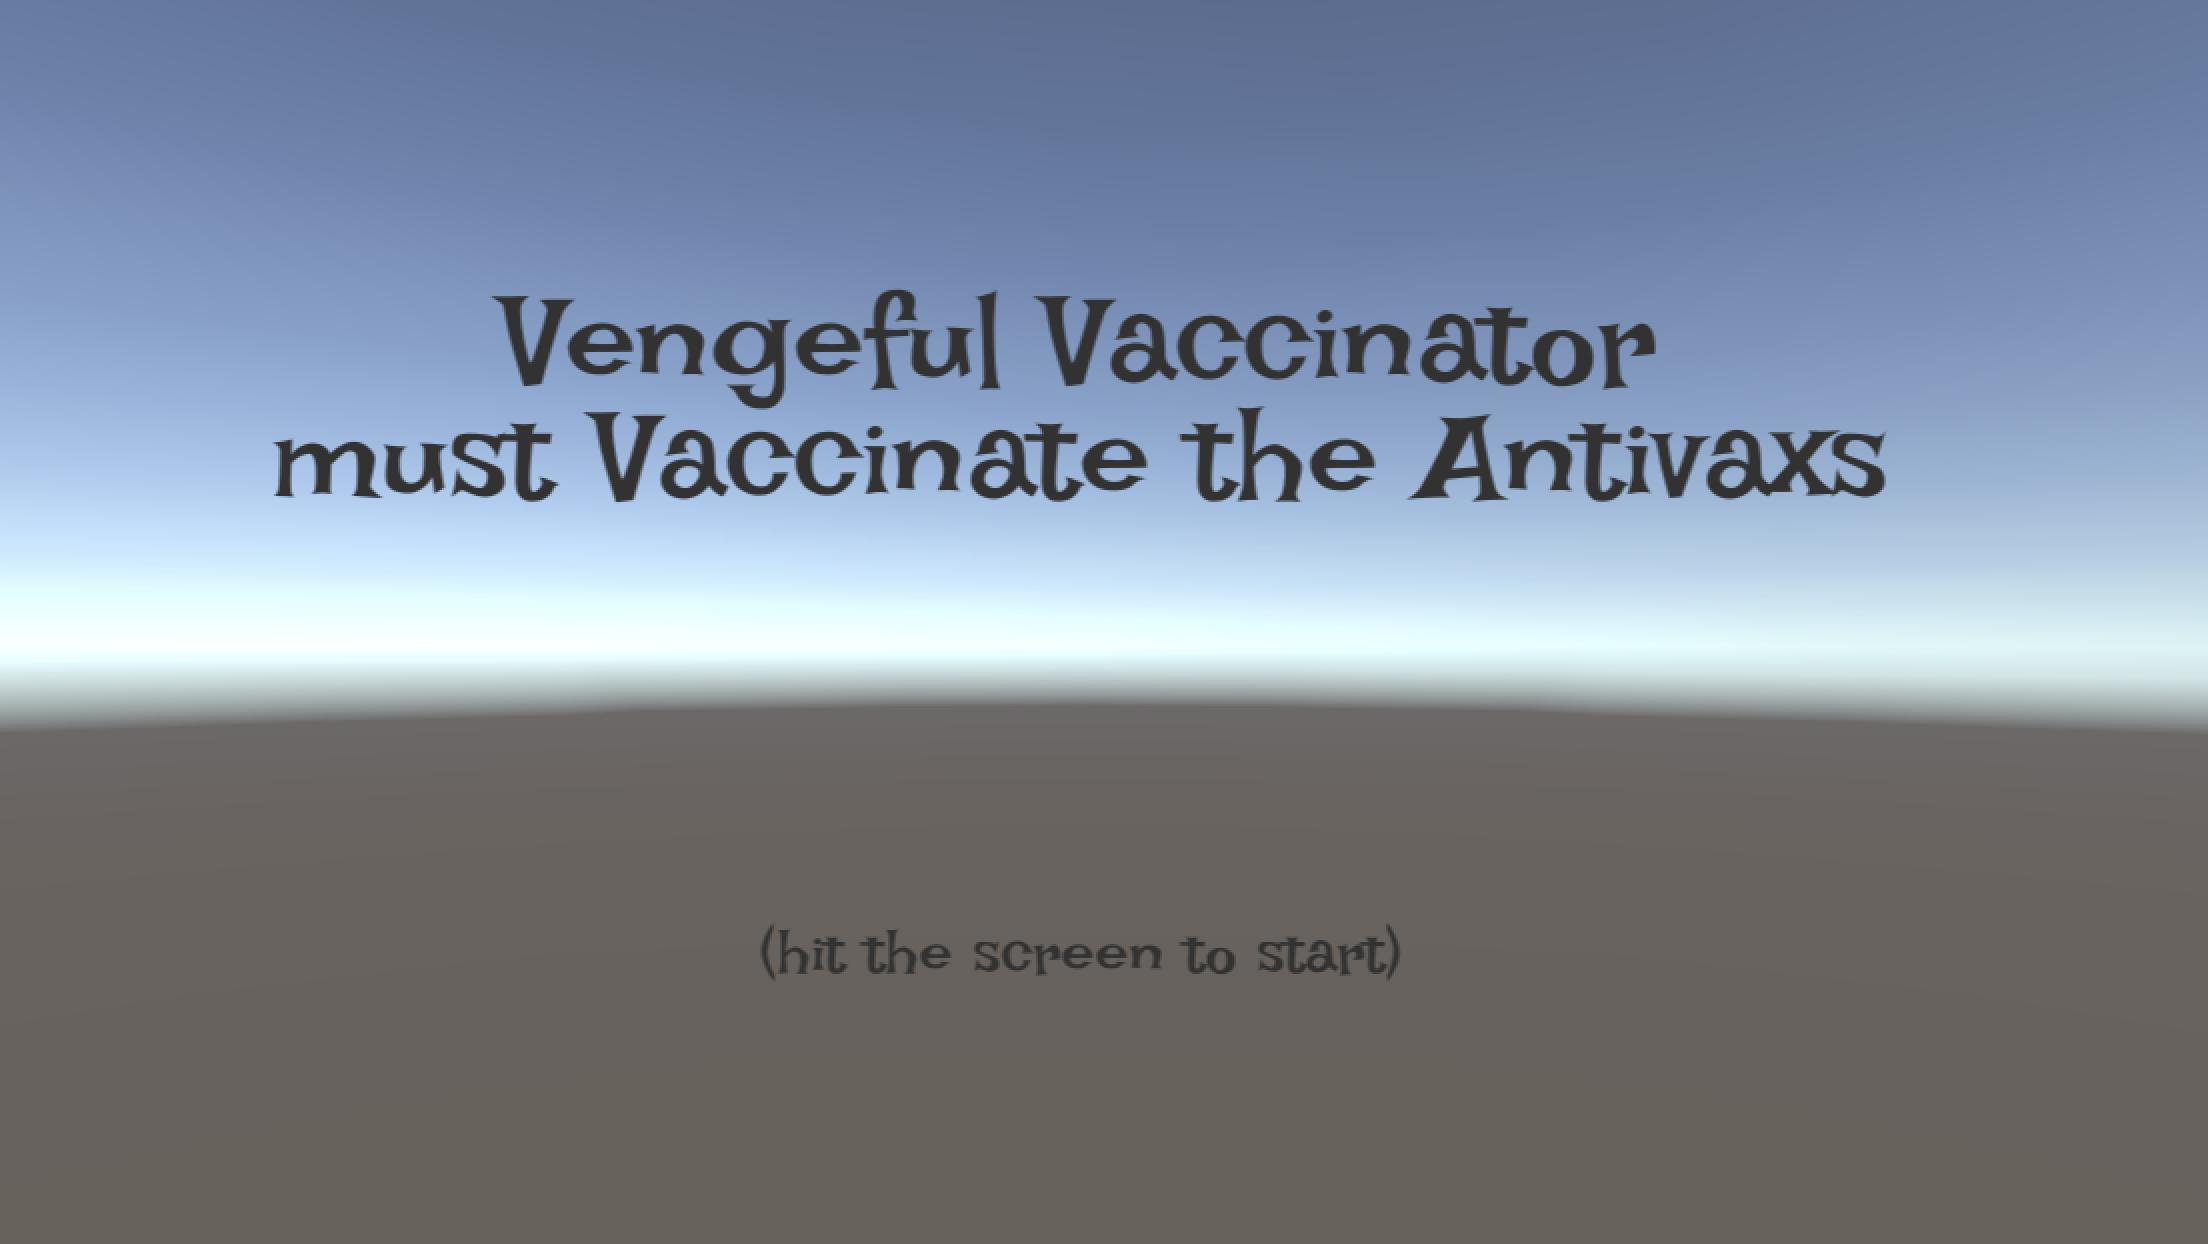 Vengeful Vaccinator must Vaccinate the Antivaxs